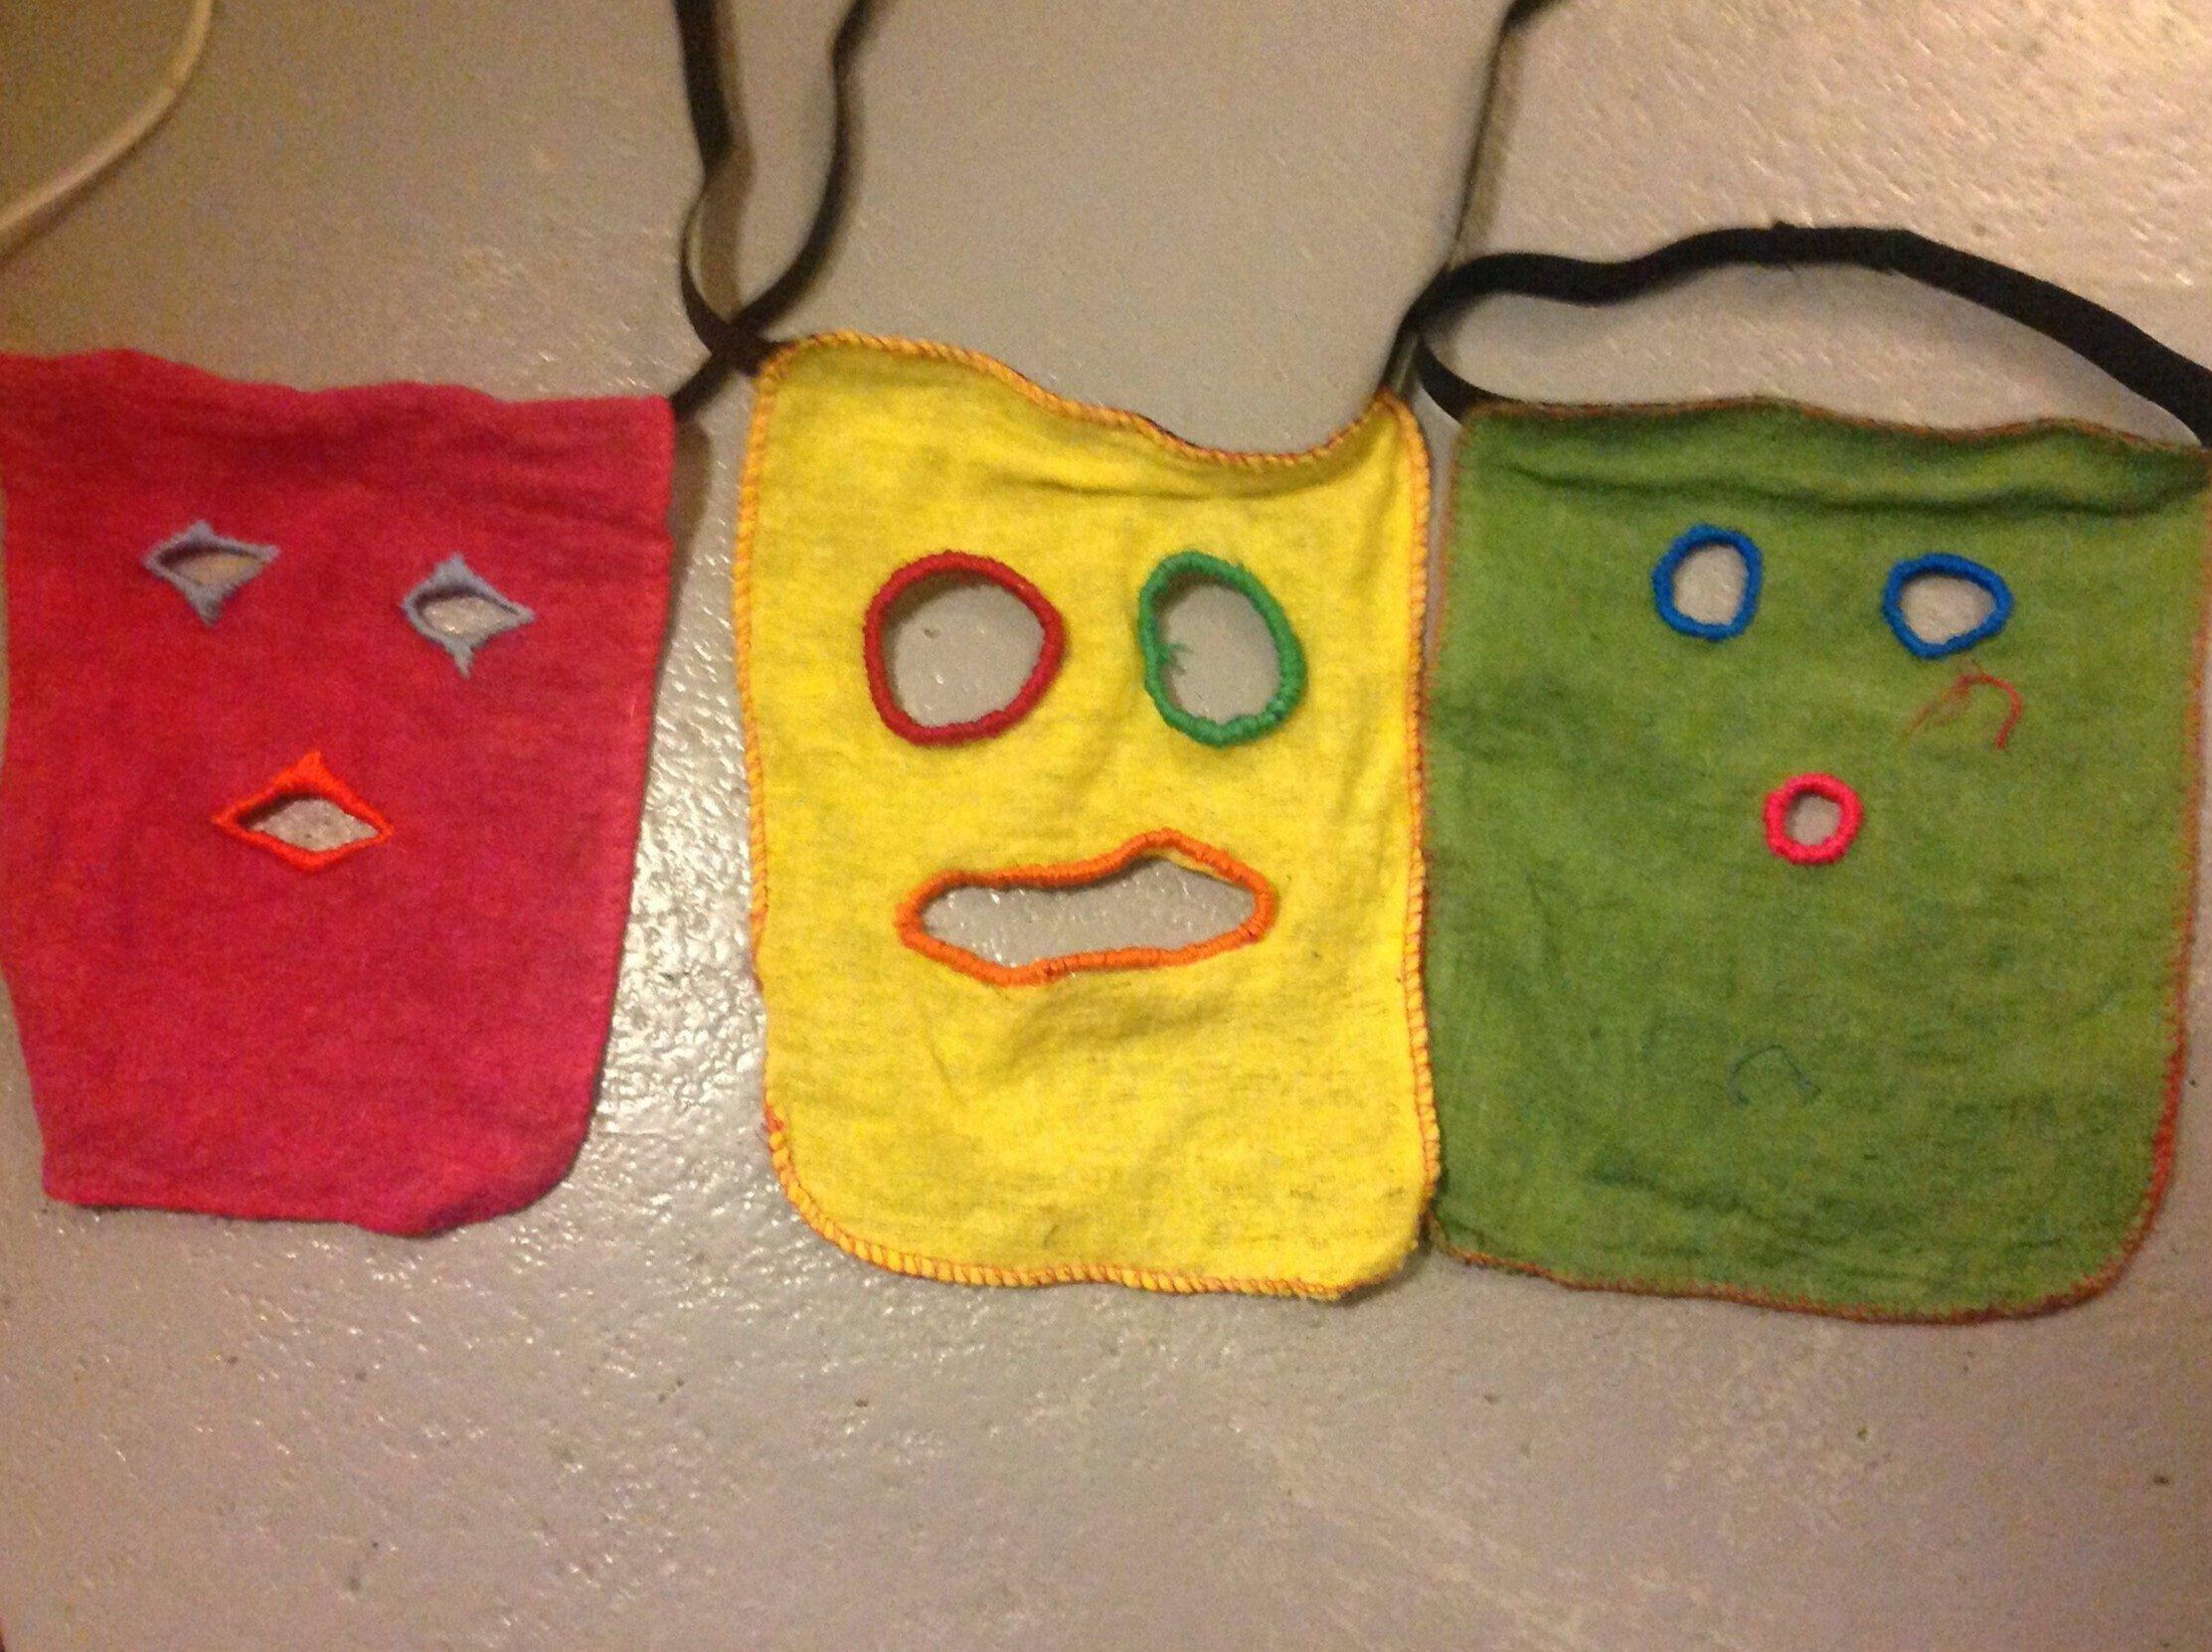 Hayley+Newman_The+Gluts+Masks.jpg